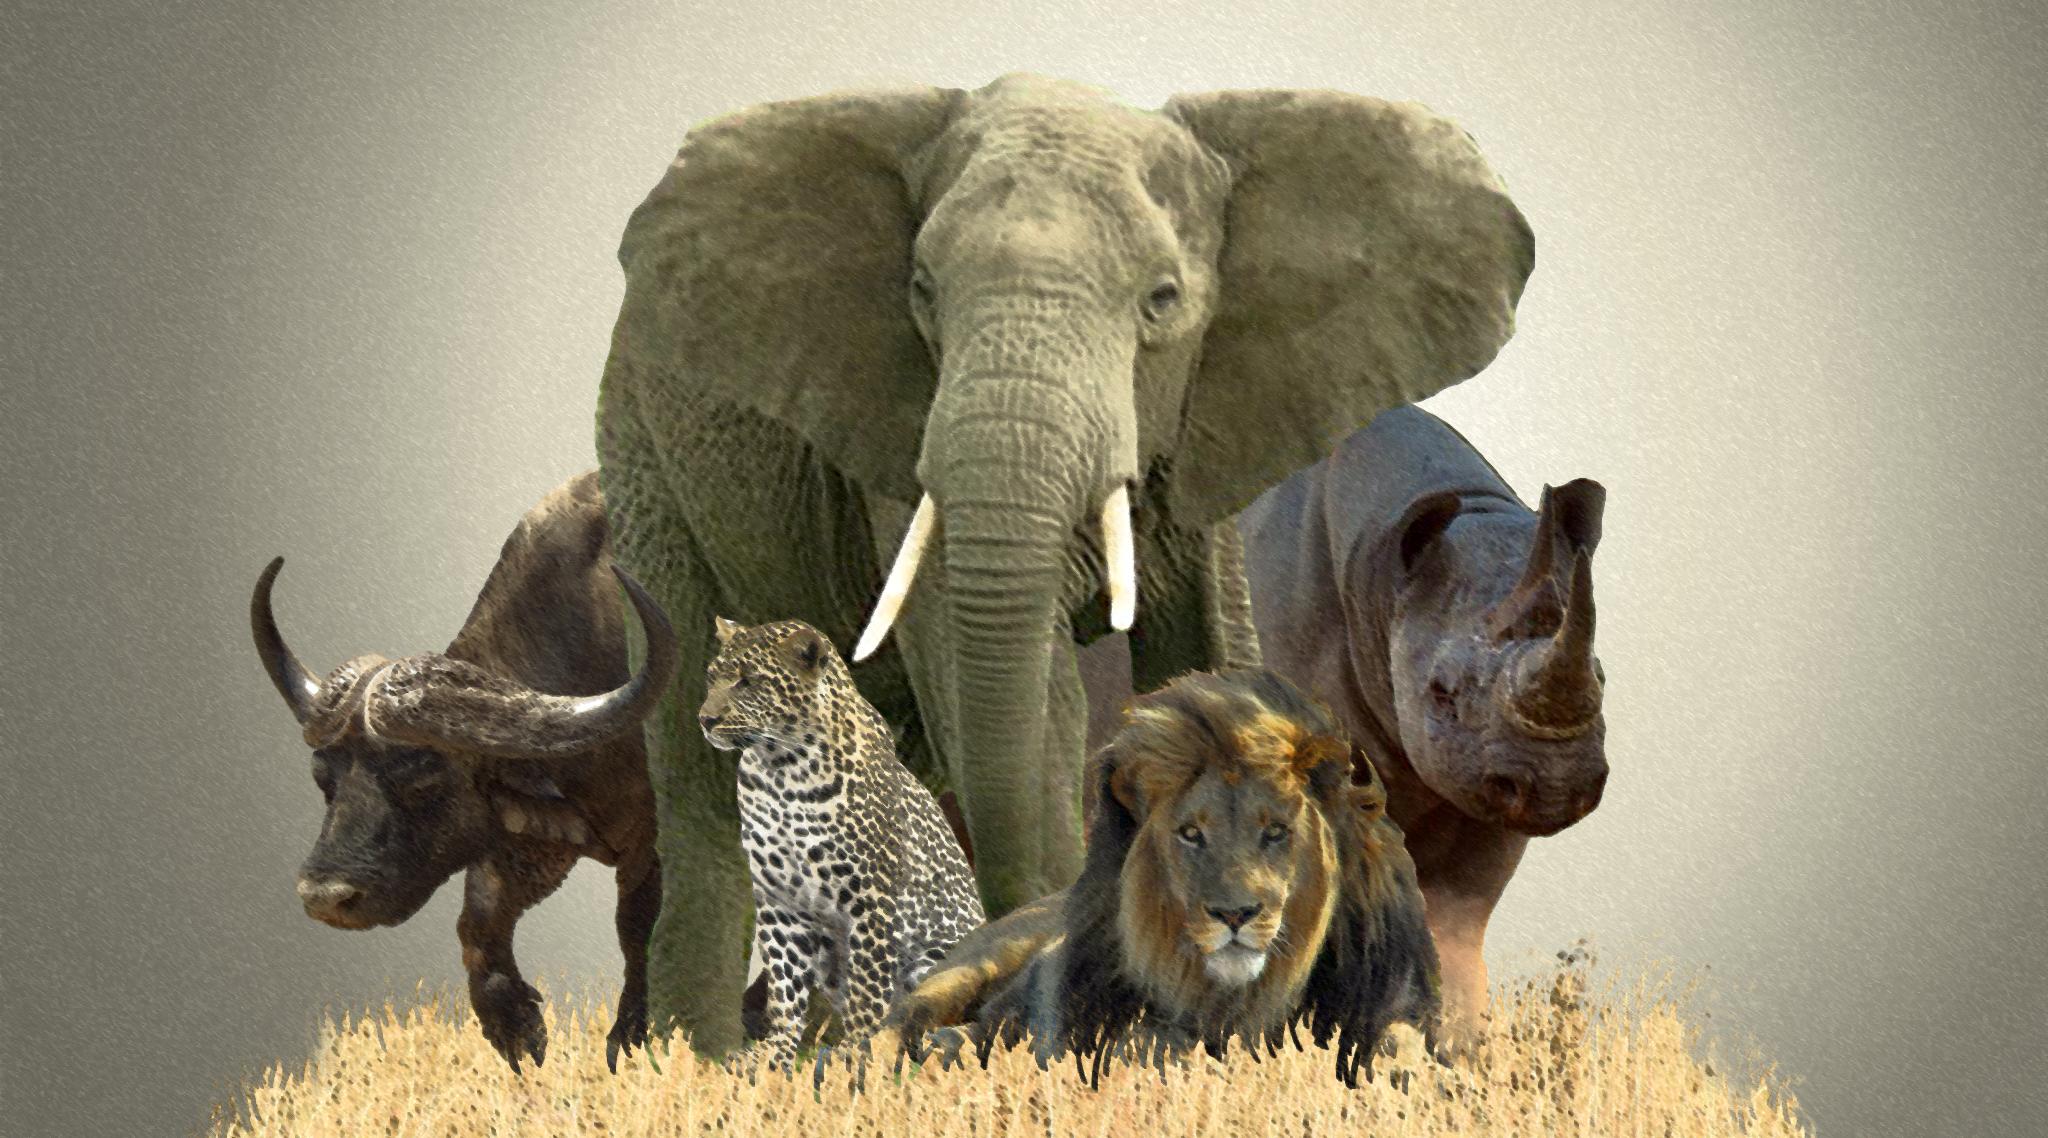 пять зверей картинки пальпации фото